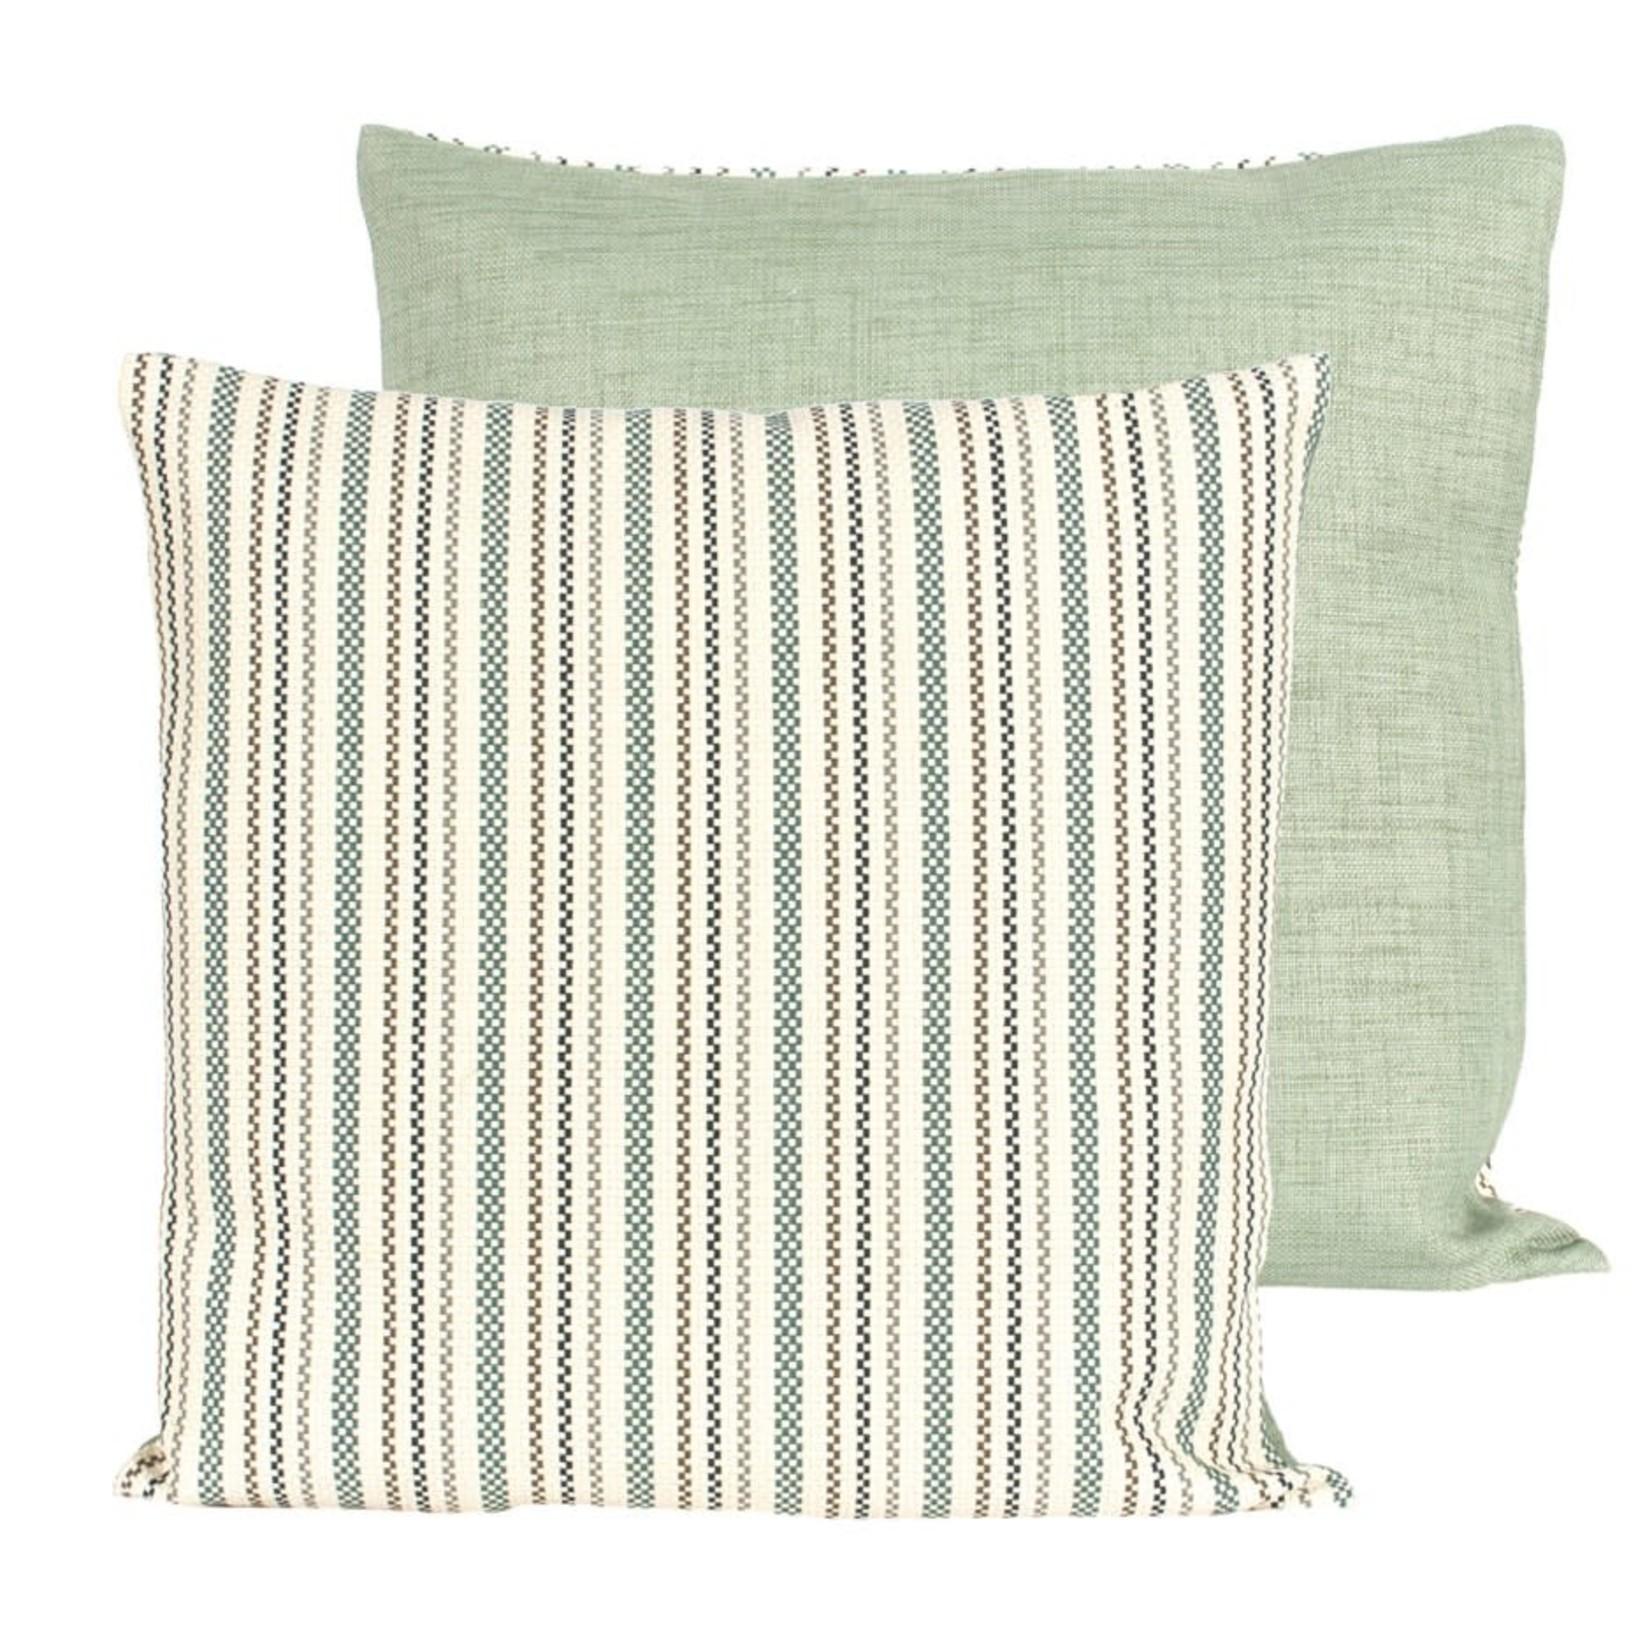 Mist Stripe Pillow